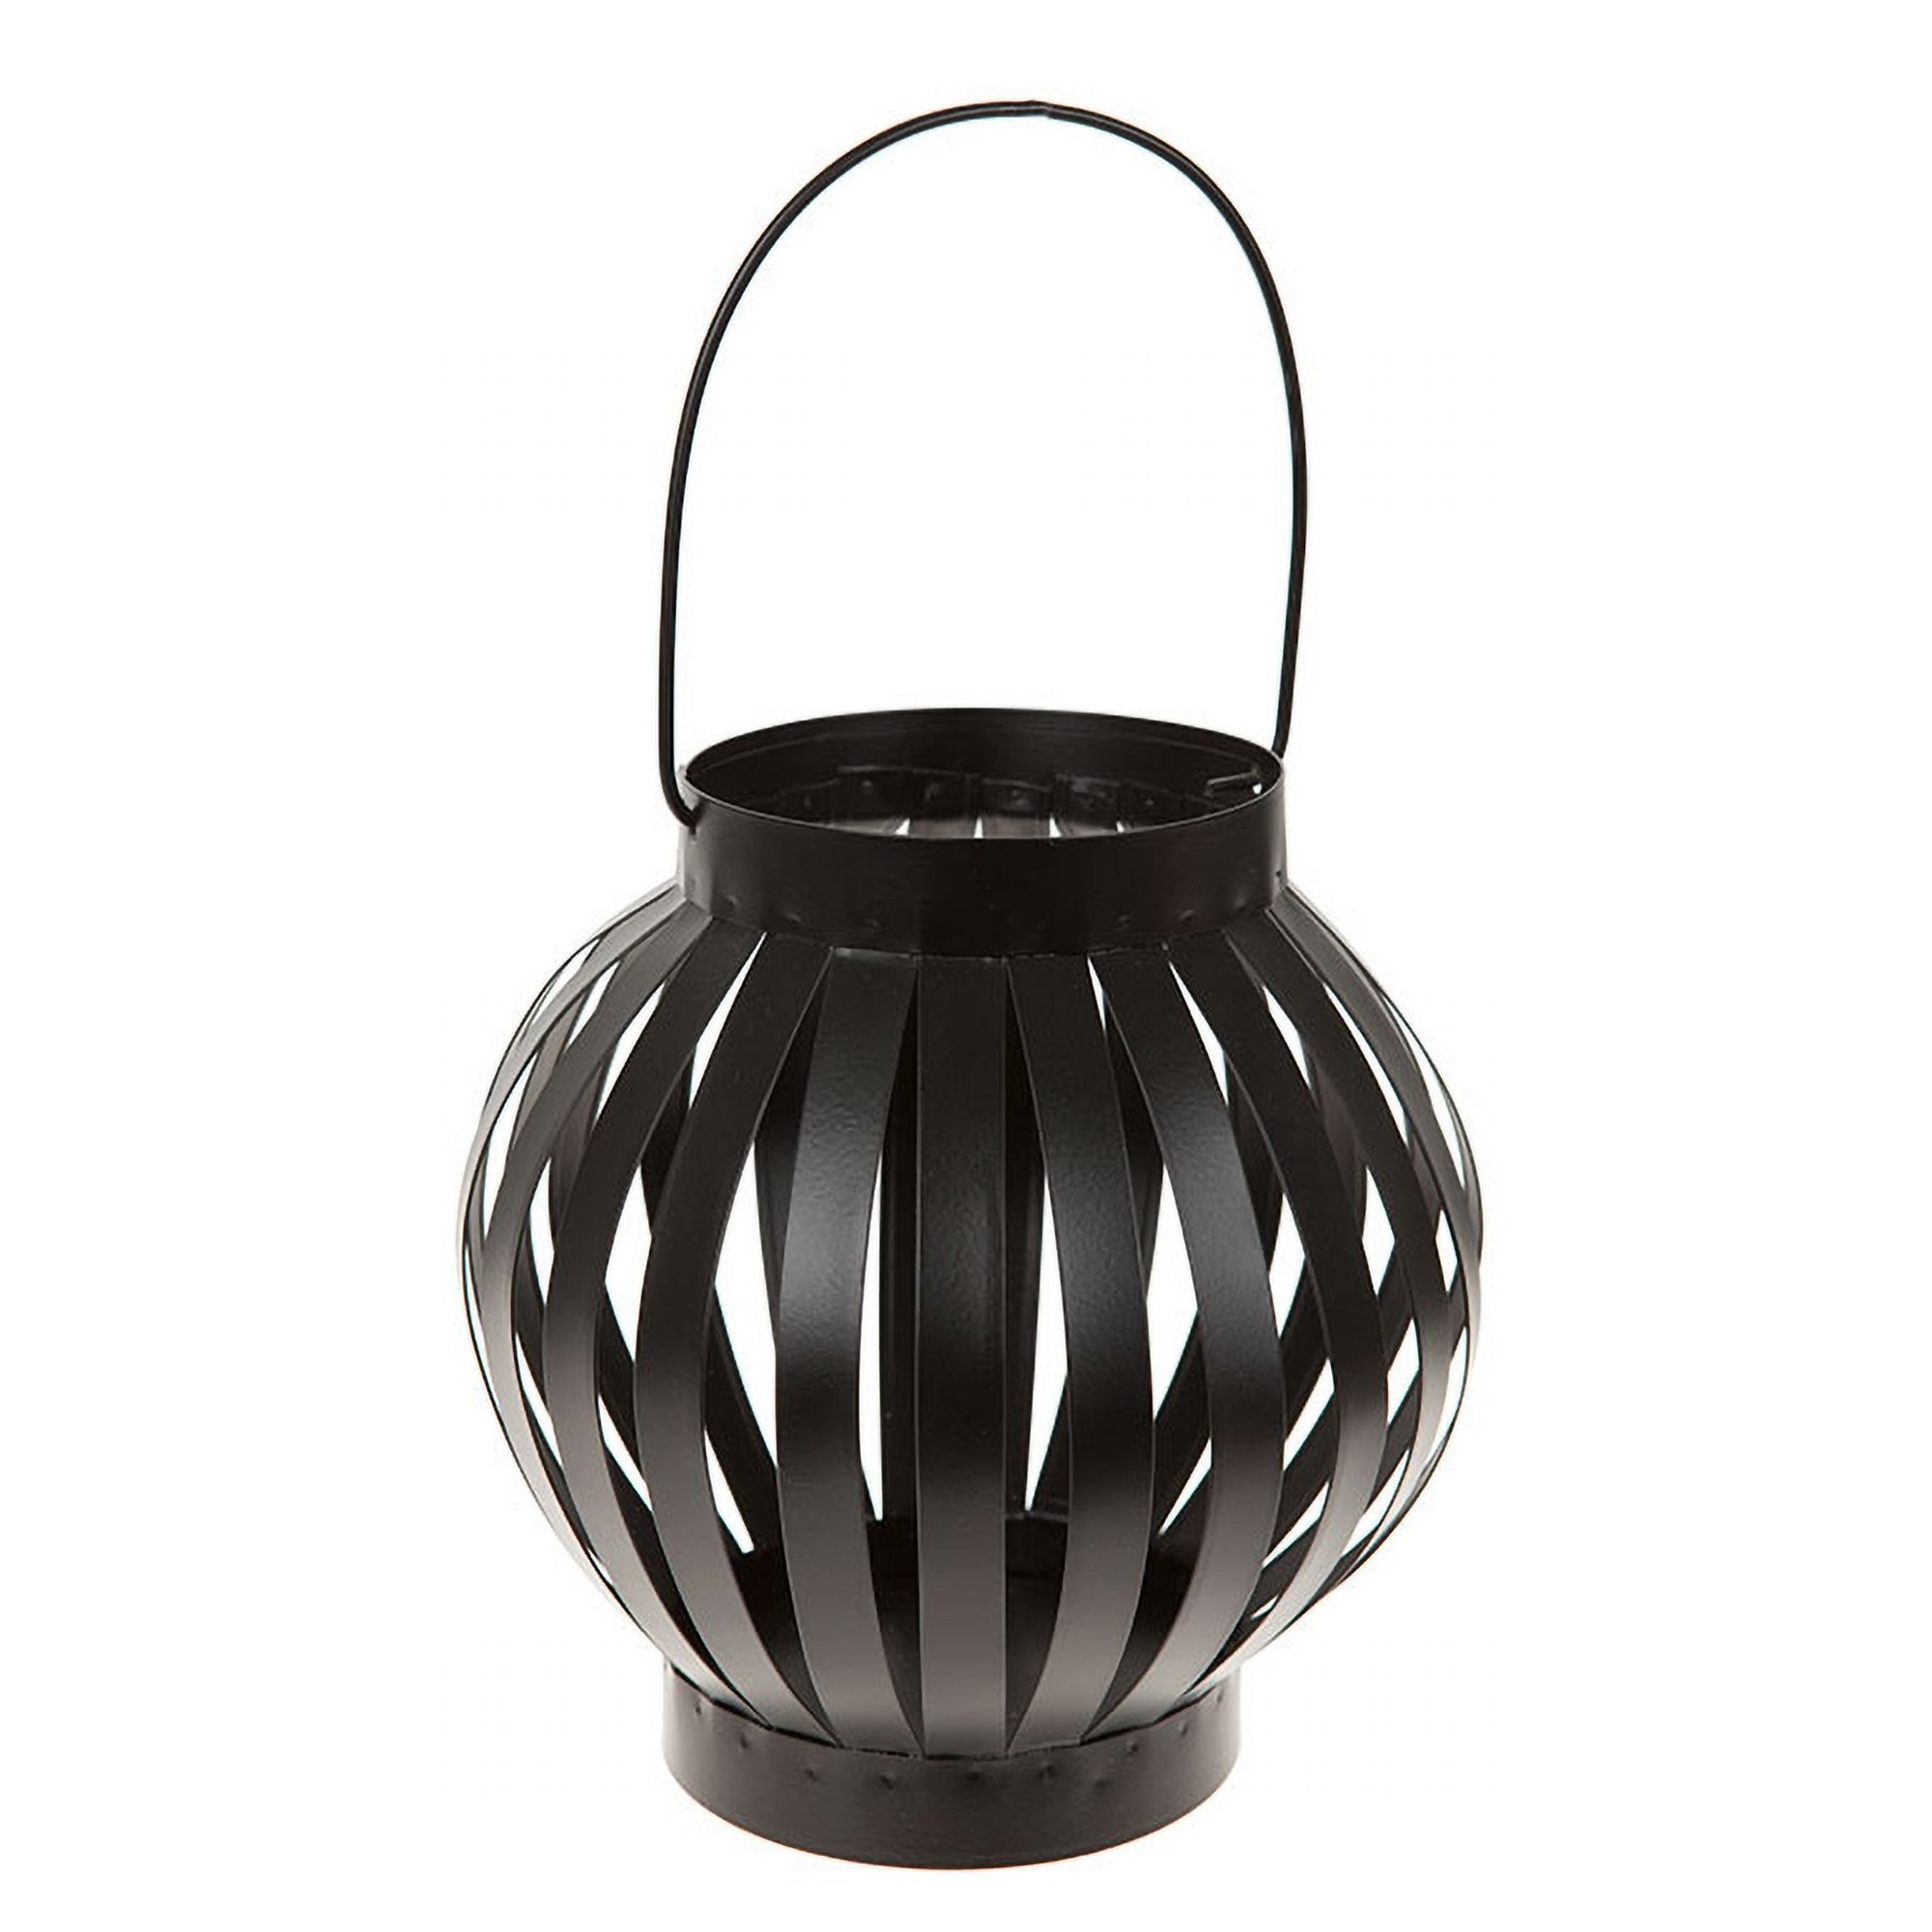 Image of Round Hanging Candle Lantern